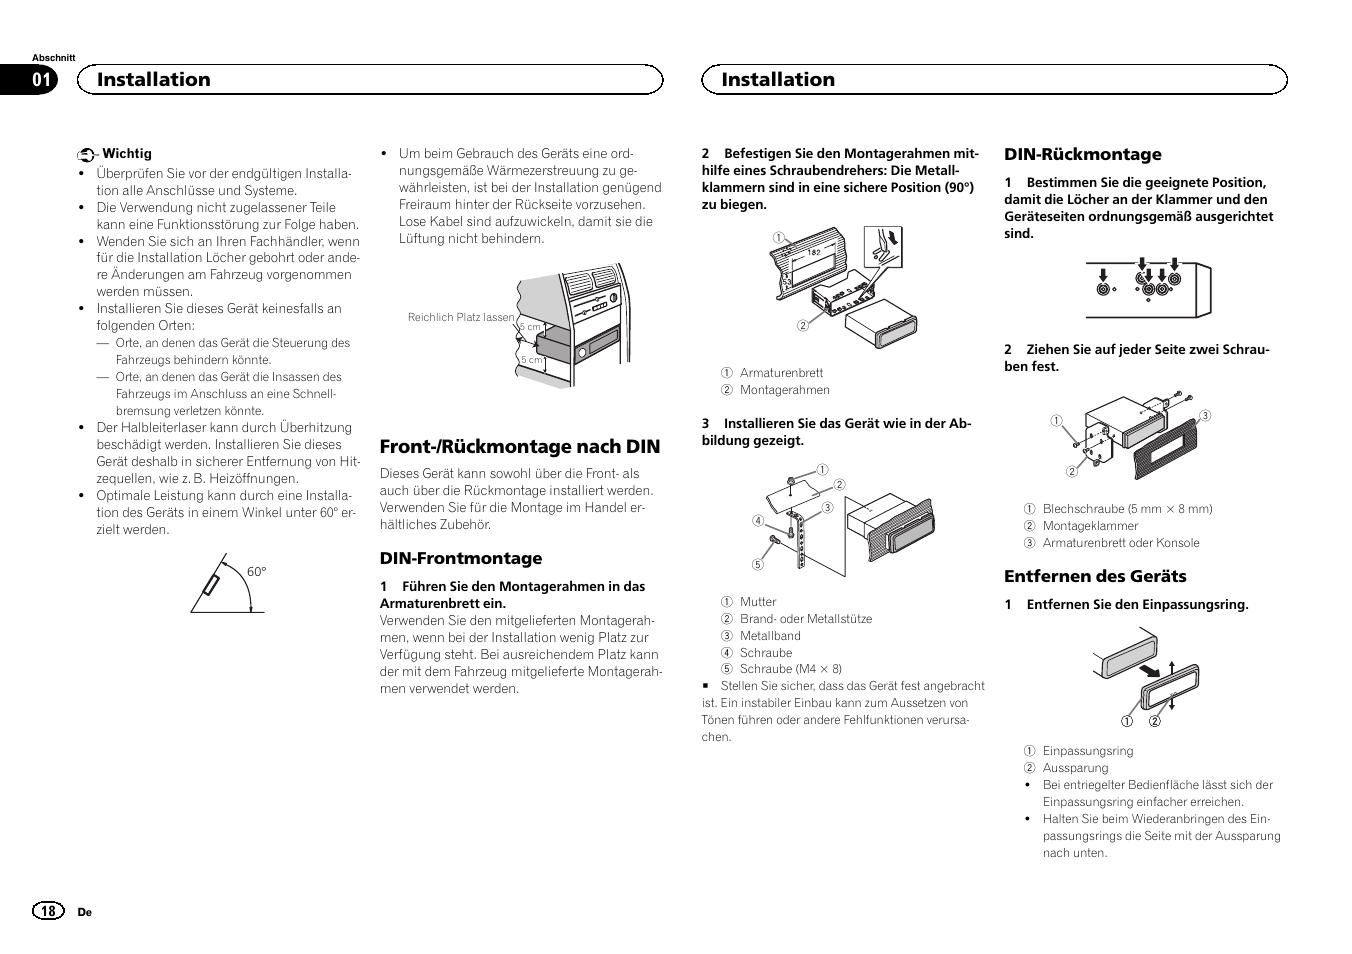 front r ckmontage nach din installation pioneer deh 6400bt user rh manualsdir com Pioneer Deh 64Bt Owner's Manual pioneer deh-6400bt installation manual